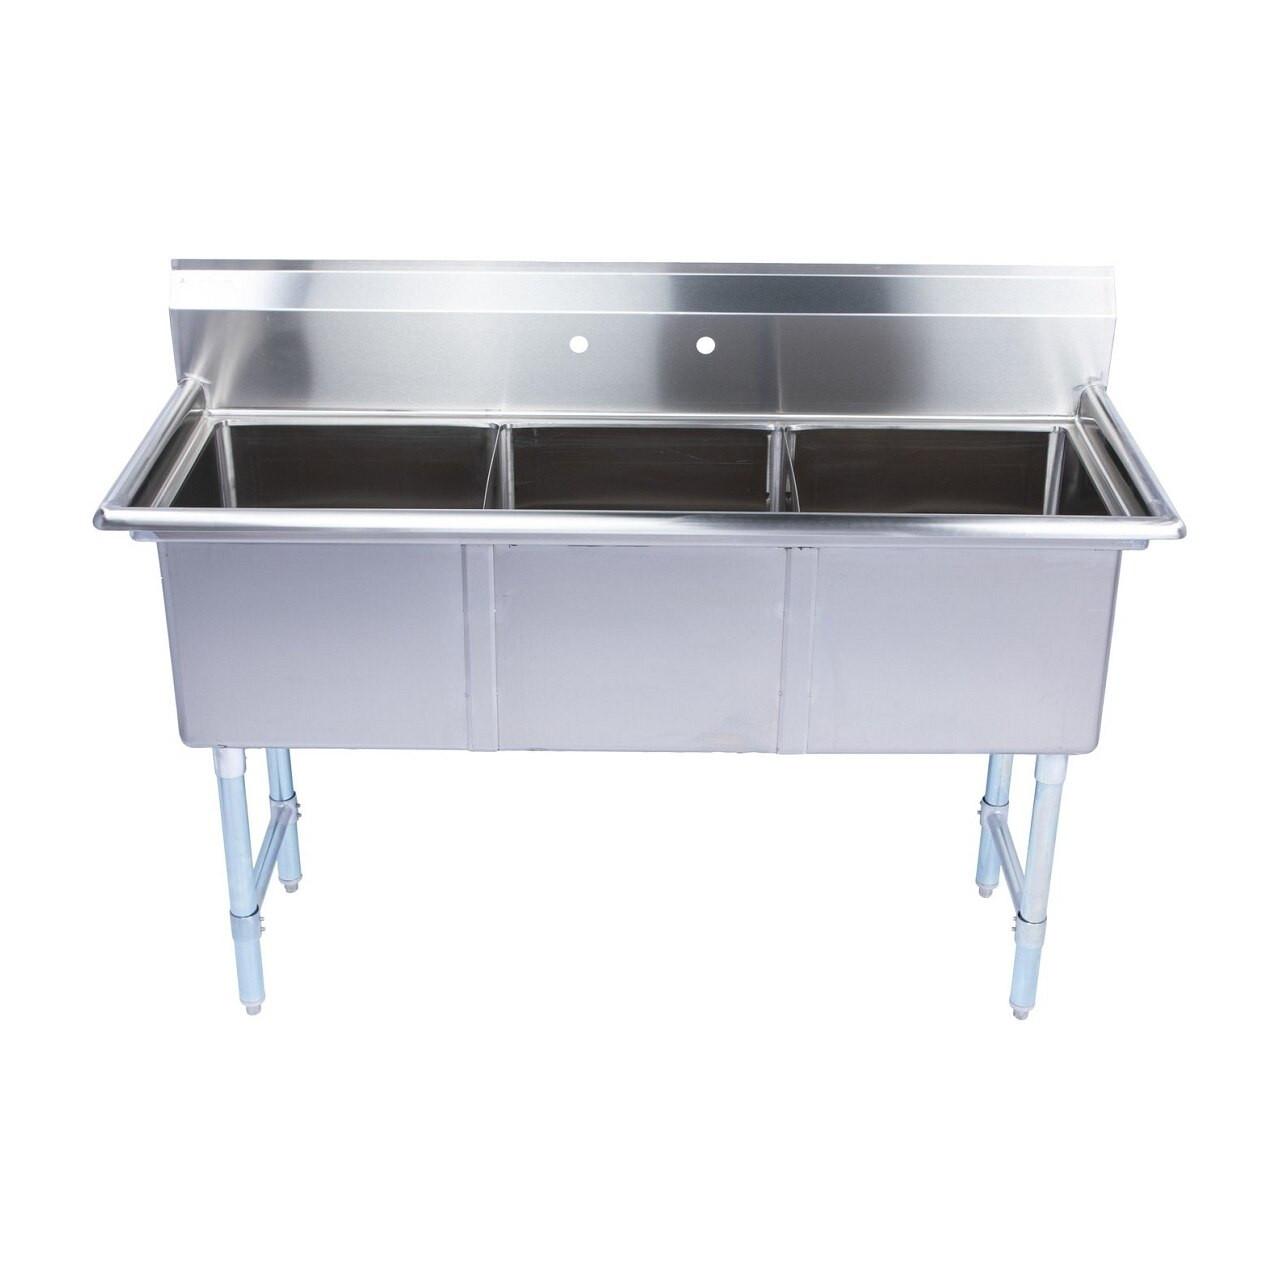 kcs kcsd316 1818 3 stainless steel 3